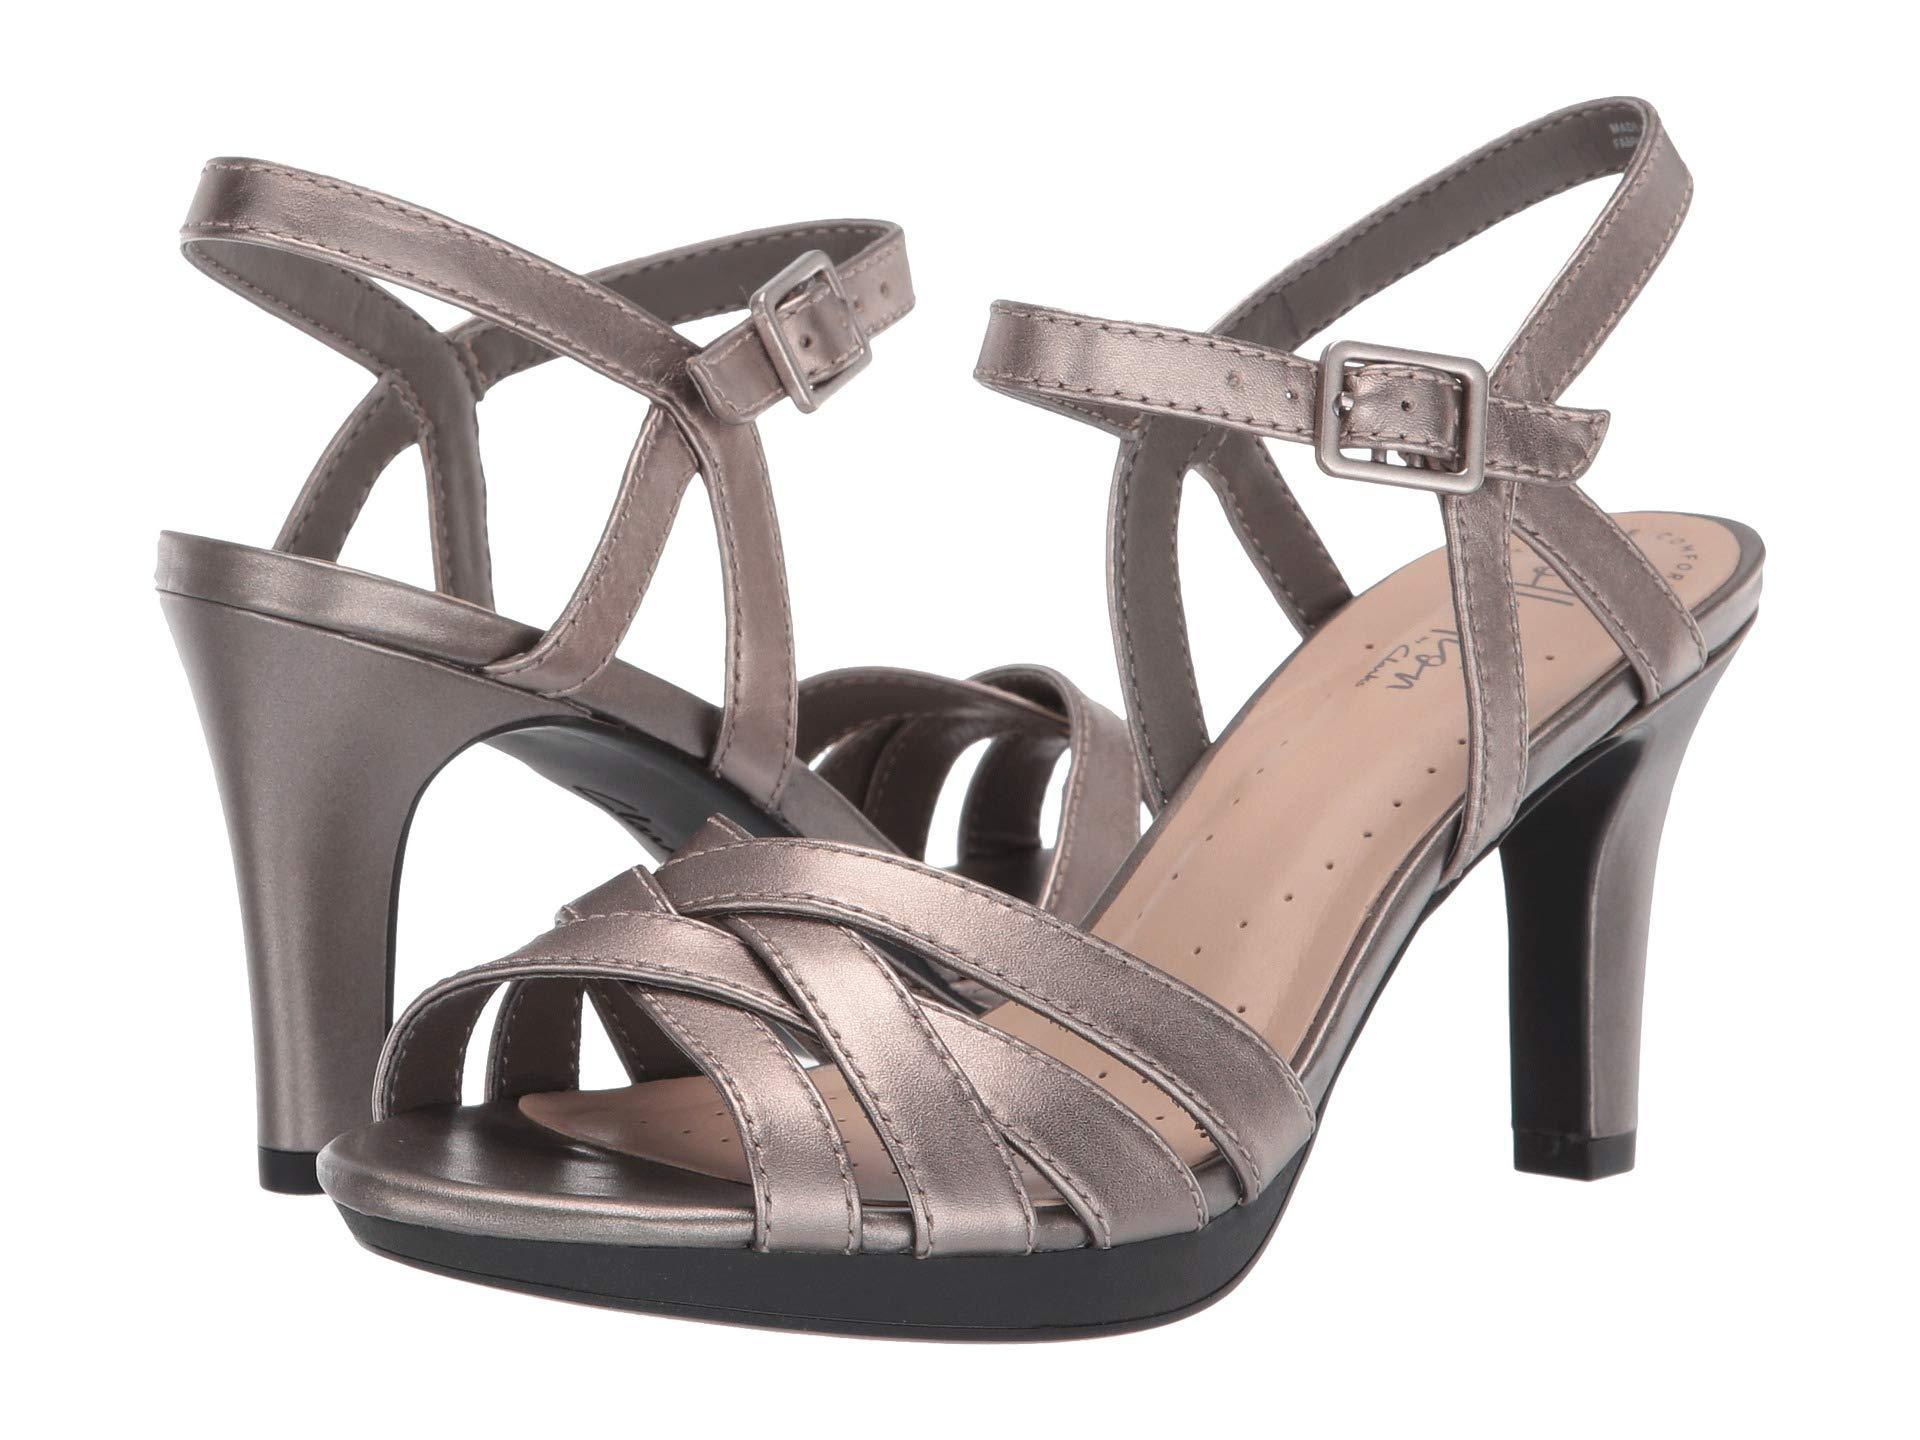 fbe03046a66 Clarks. Women s Adriel Wavy (pewter Leather) High Heels